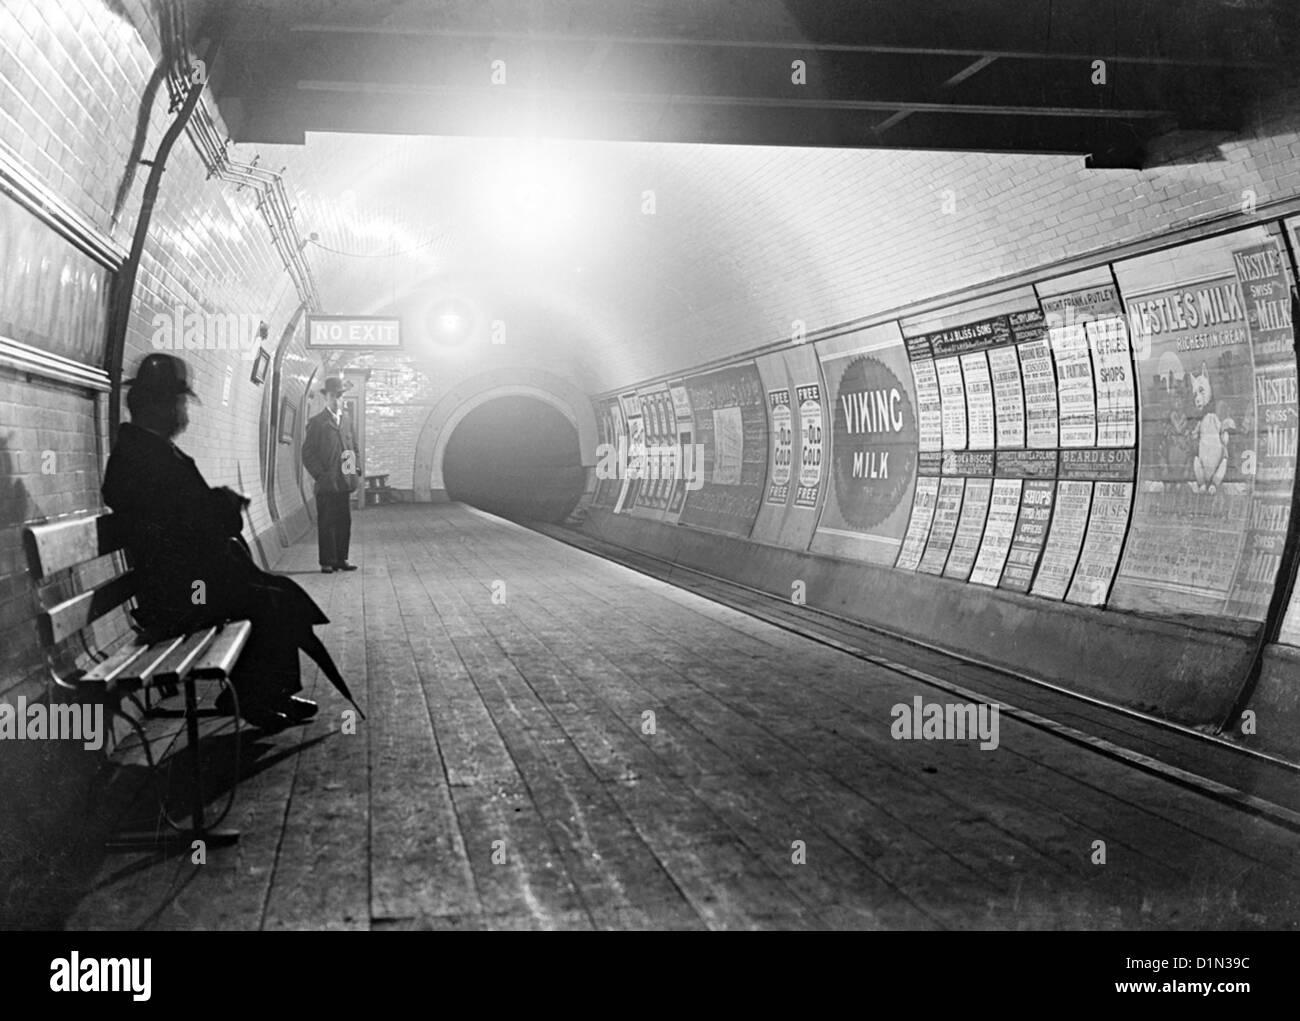 London Underground, circa late 1800's, London, Britain, UK - Stock Image